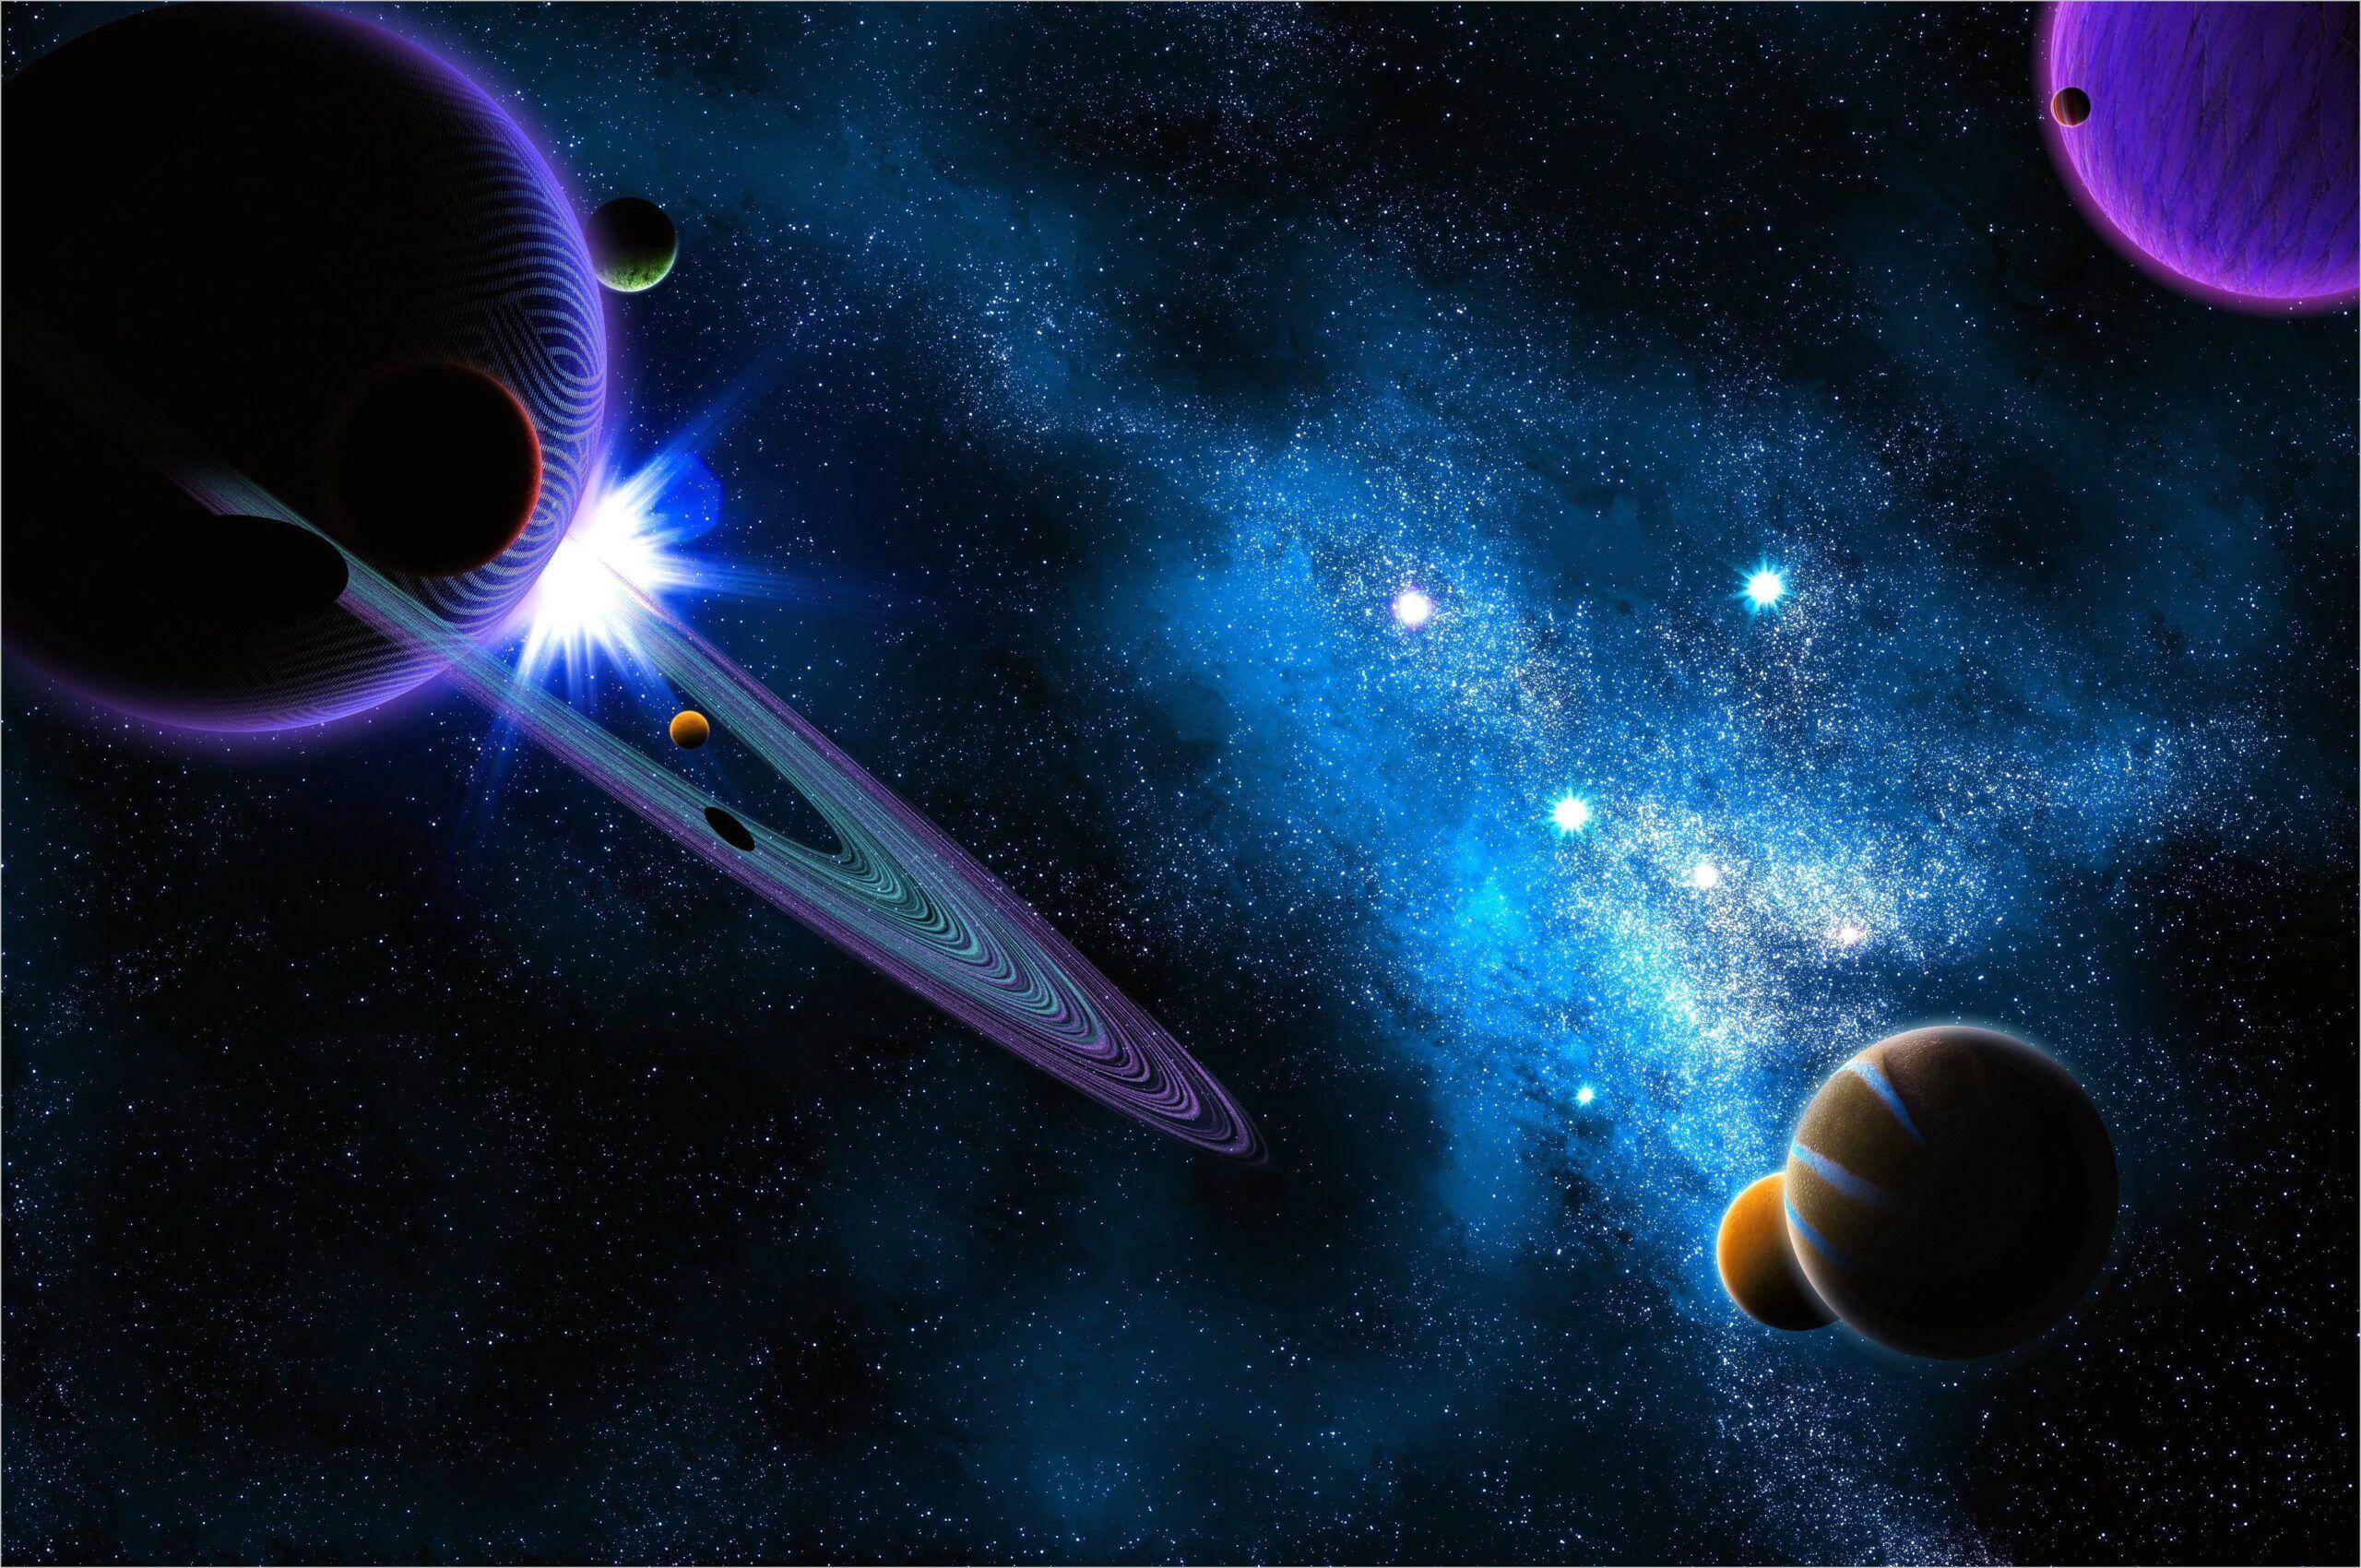 Pc Space Wallpaper 4k Galaxy Wallpaper Galaxy Art Wallpaper